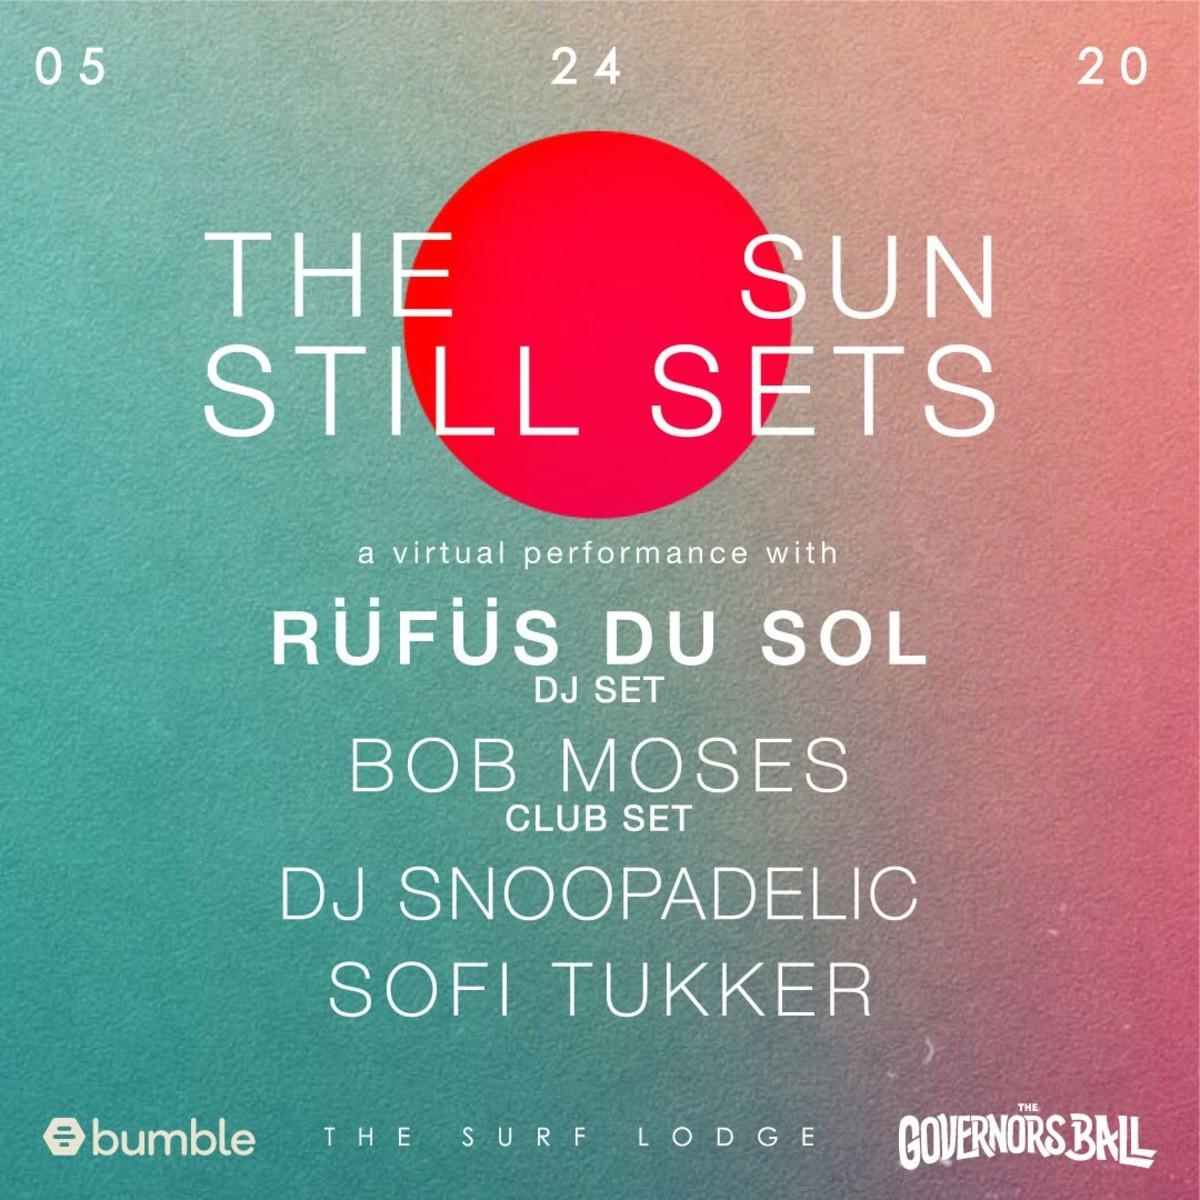 the-sun-still-sets-admat-2020-billboard-embed-1589914865-compressed